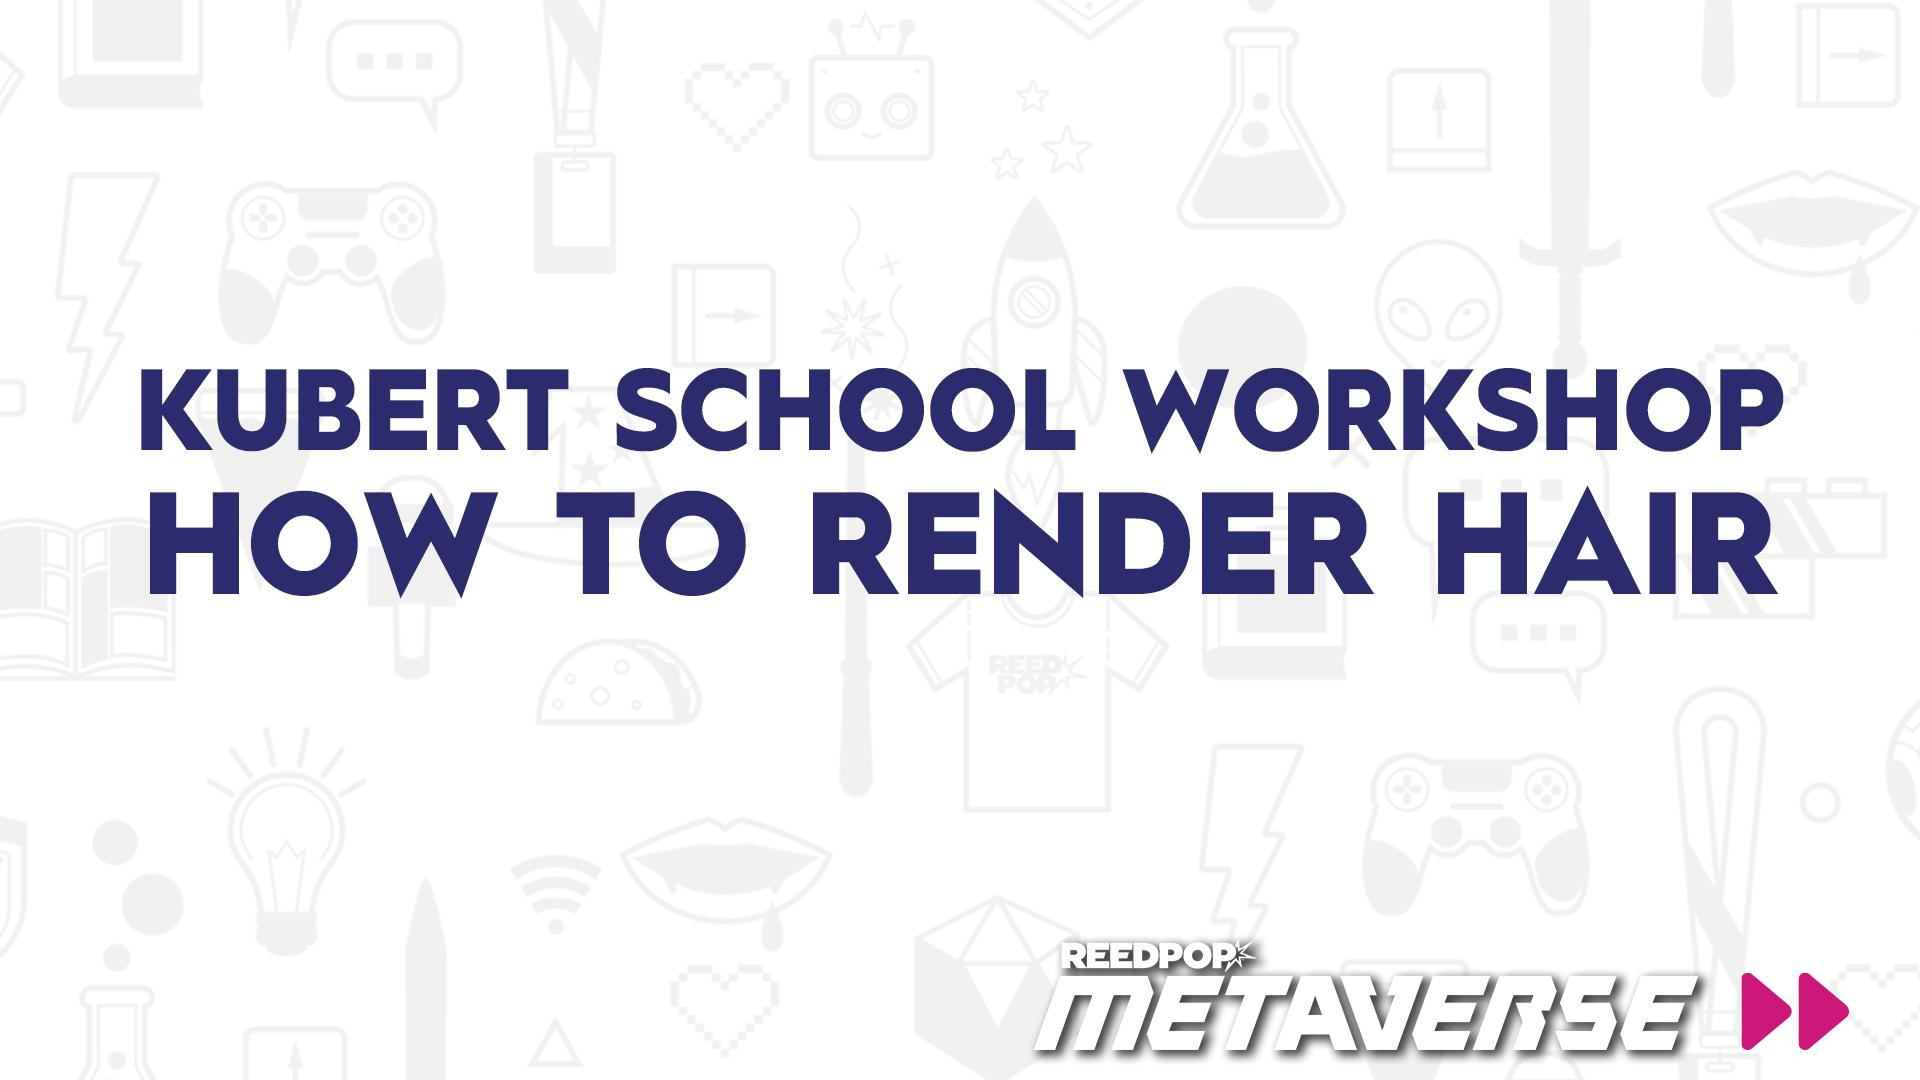 Image for Kubert School Workshops - How to Render Hair